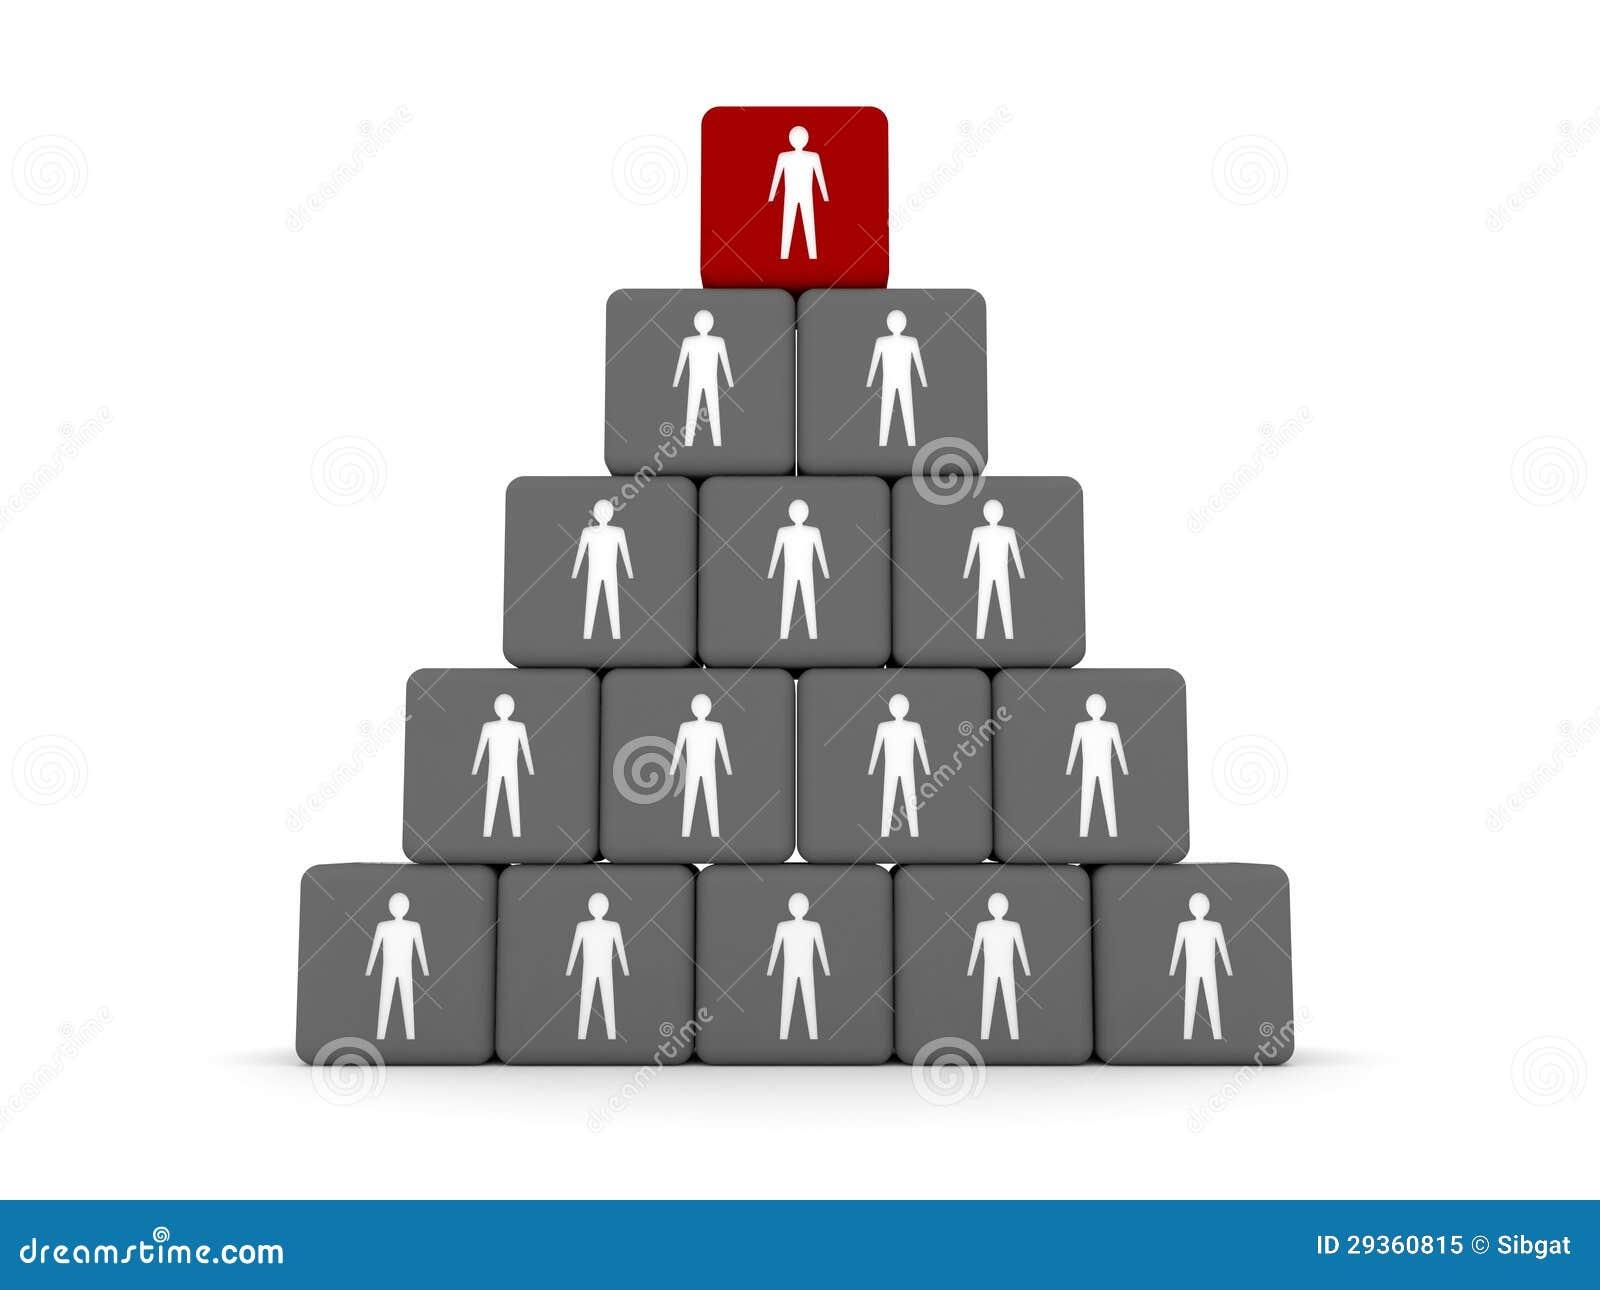 Concept hiërarchie. Leider bij de bovenkant.